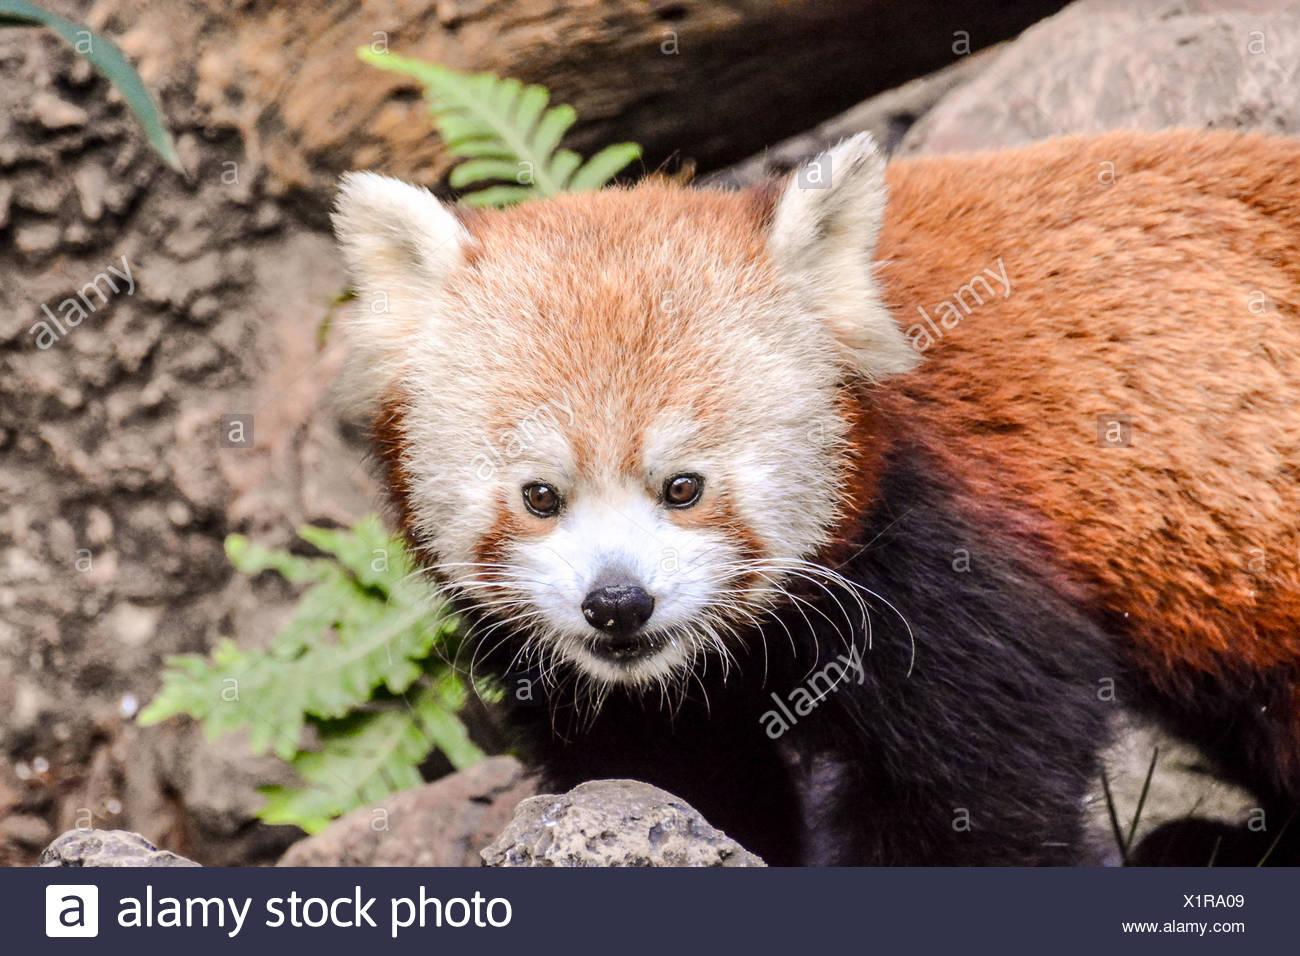 Firefox Stock Photos & Firefox Stock Images